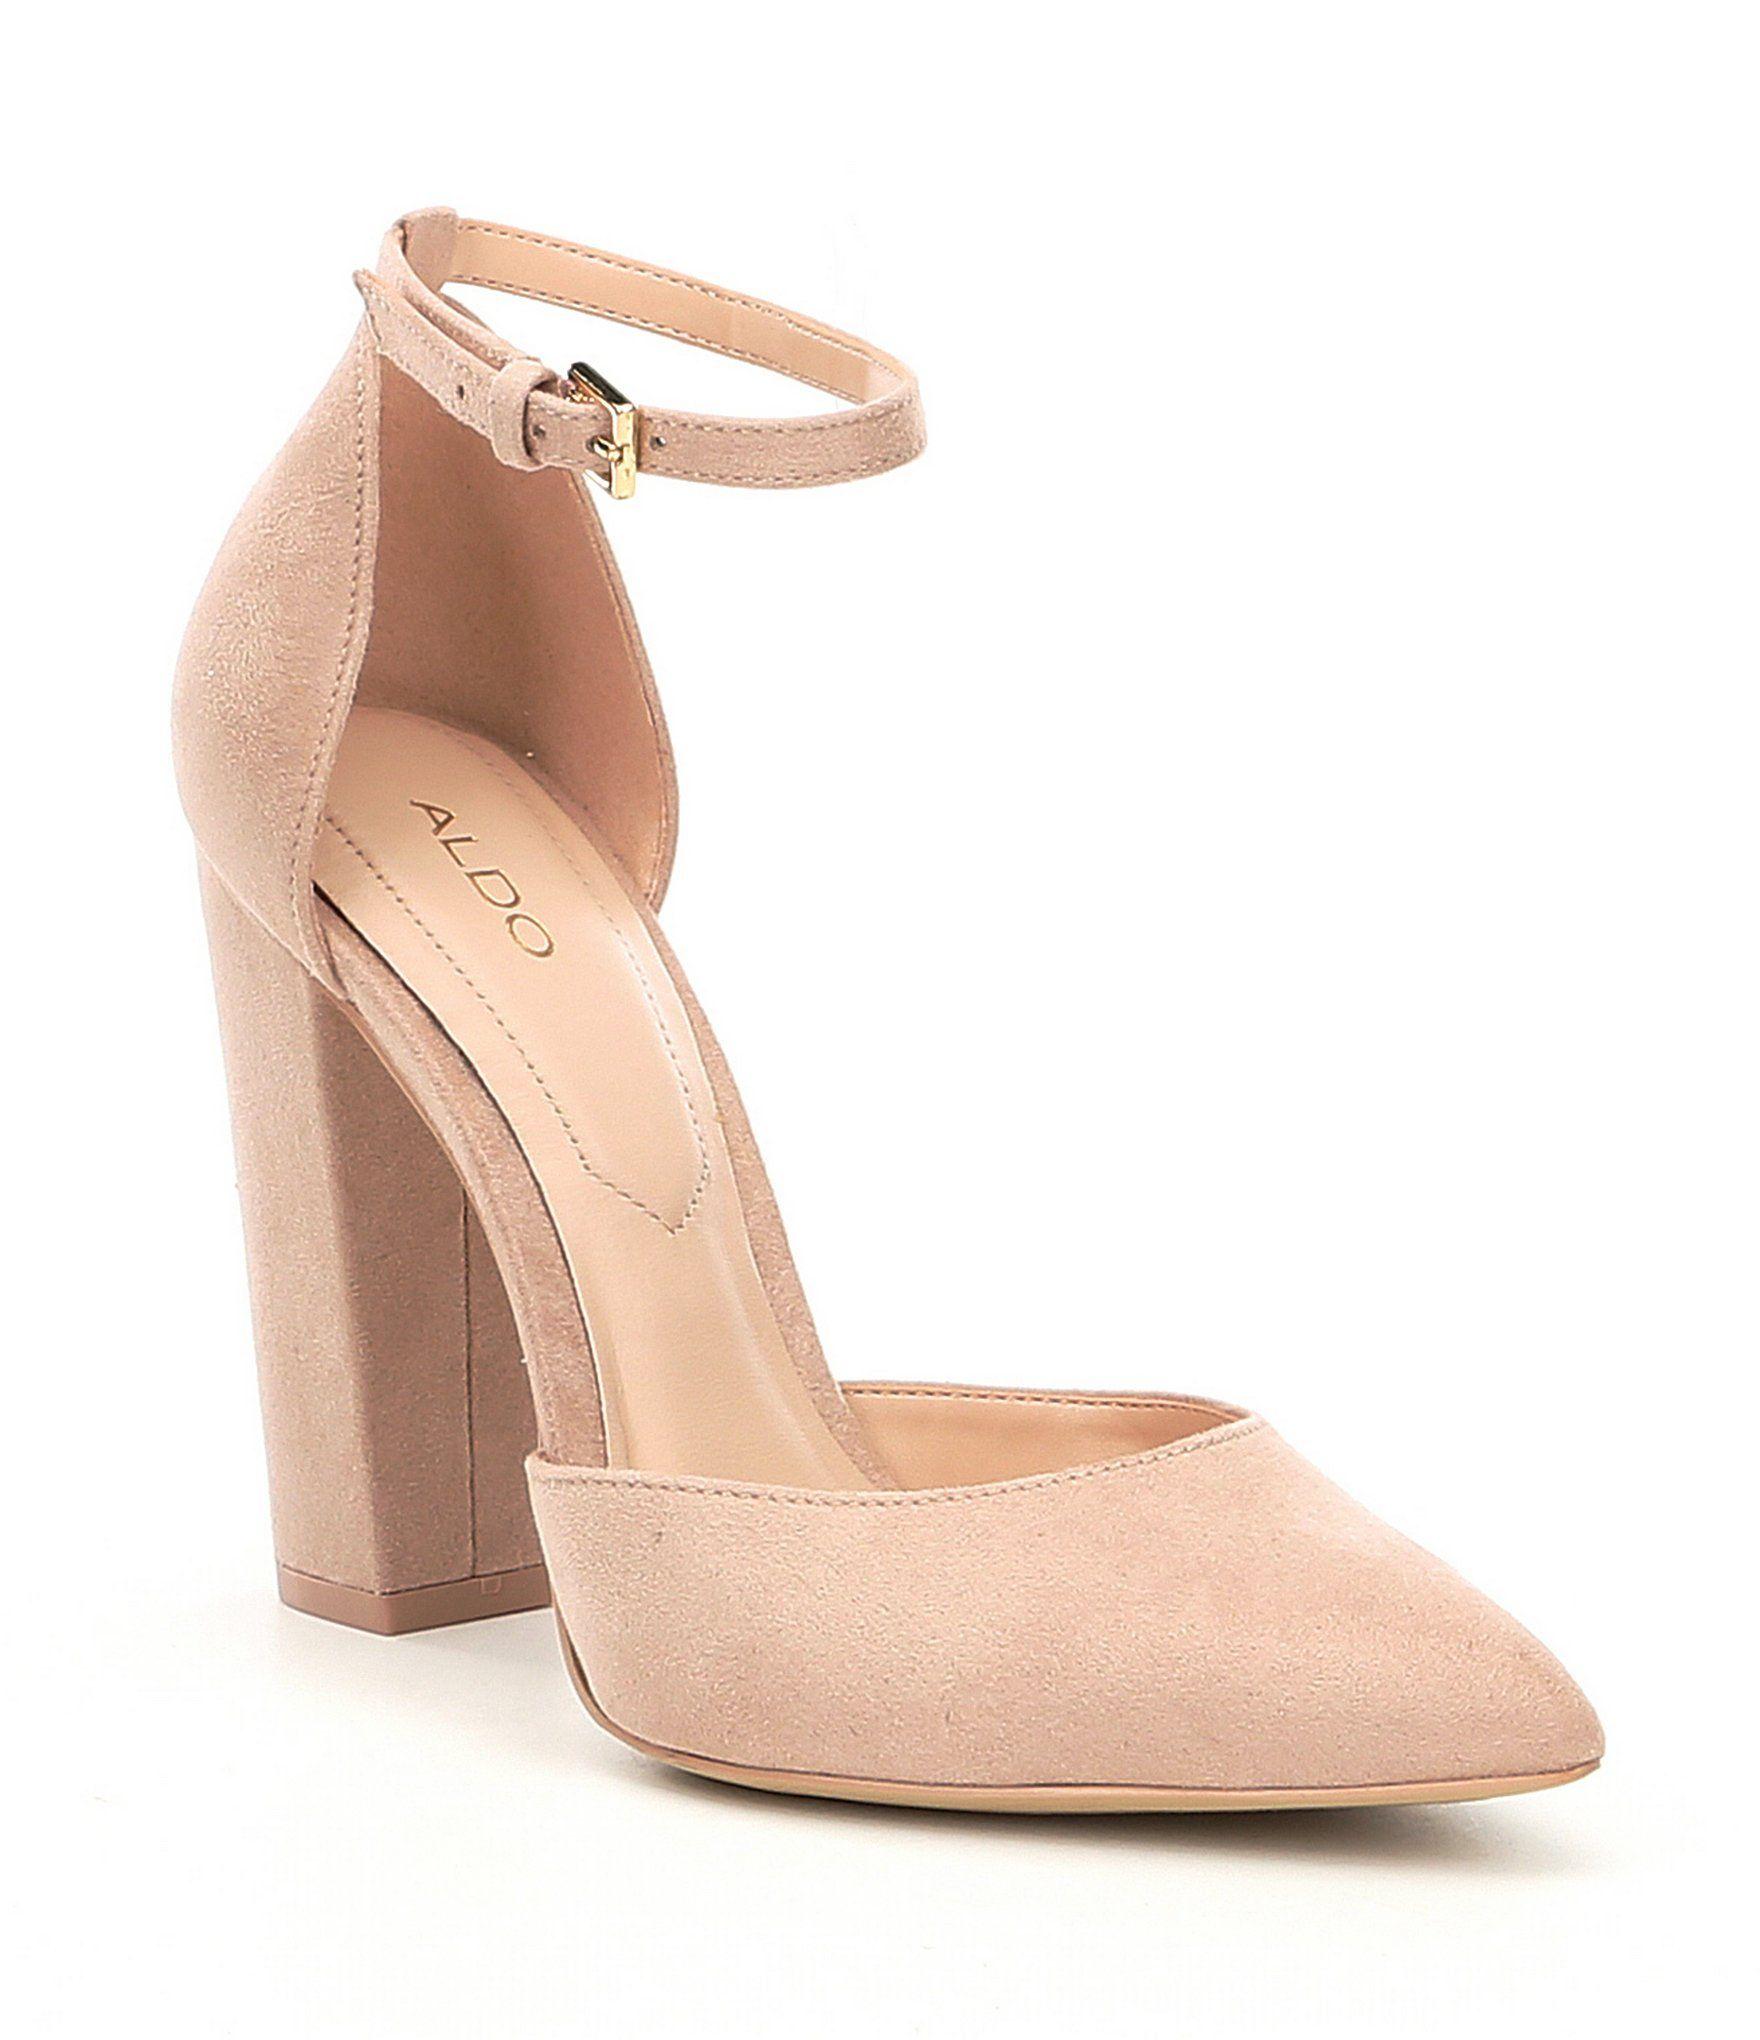 pindaniela kottke on mother of the bride   heels, block